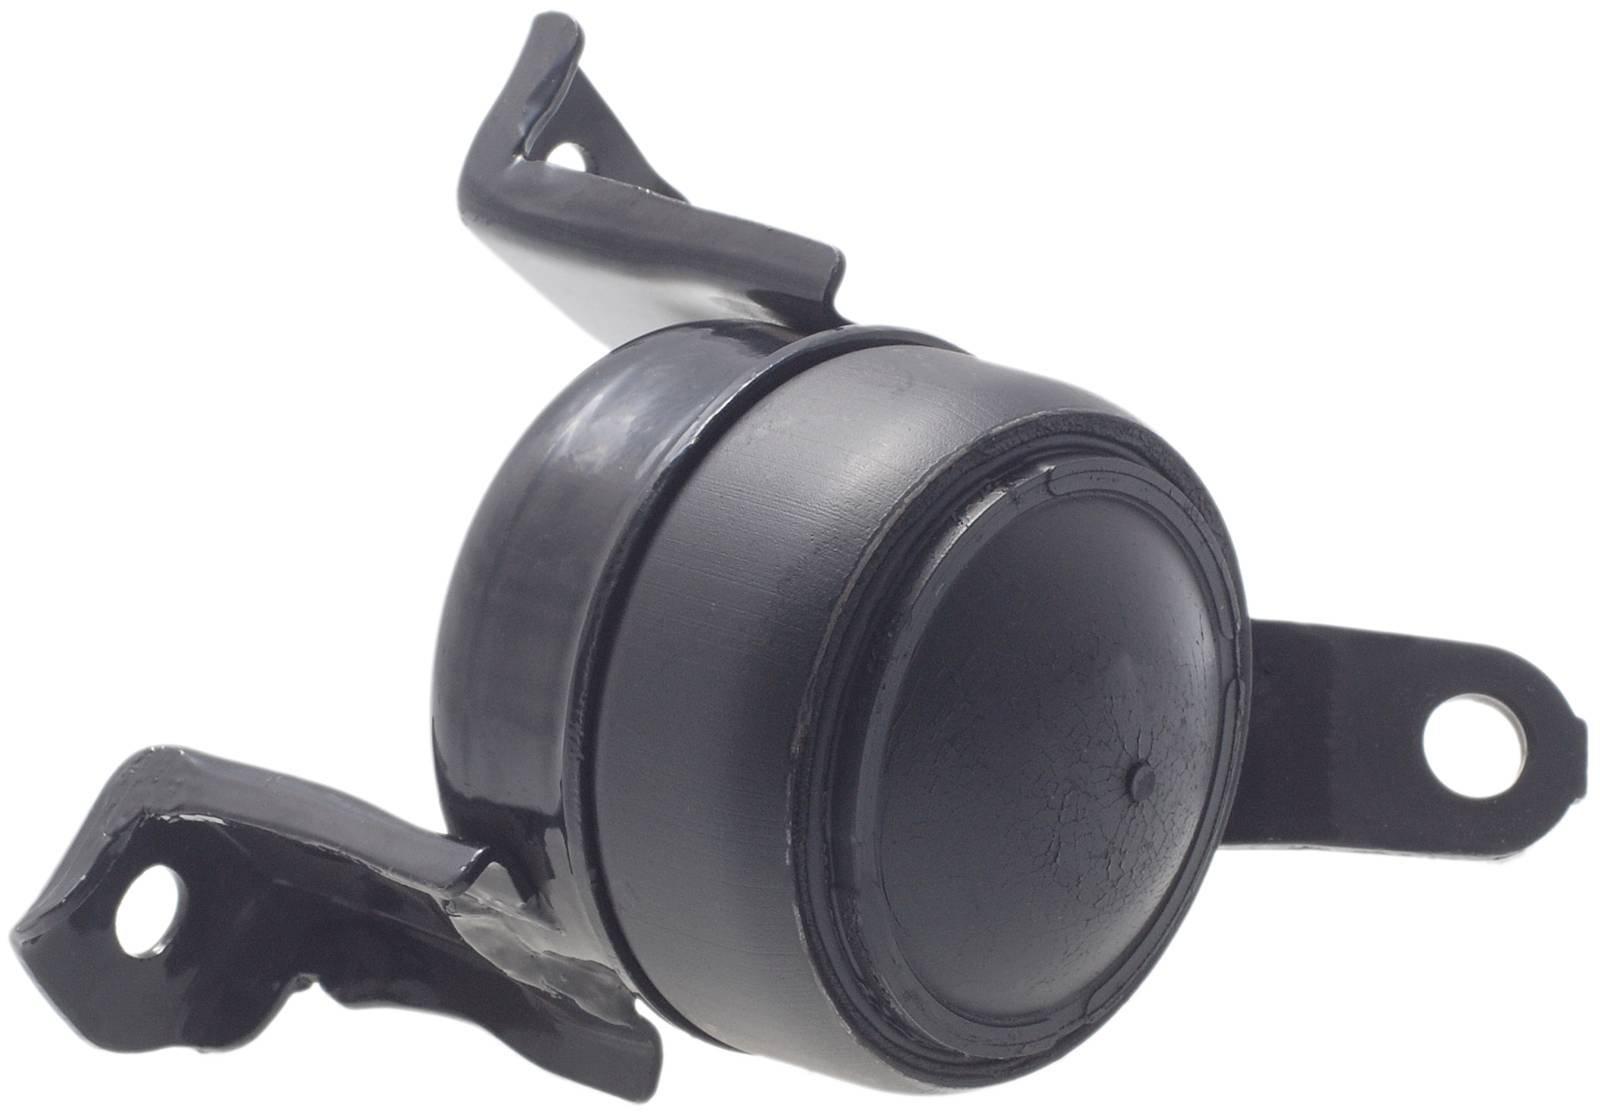 RIGHT ENGINE MOUNT - Febest # TM-063 - 1 Year Warranty